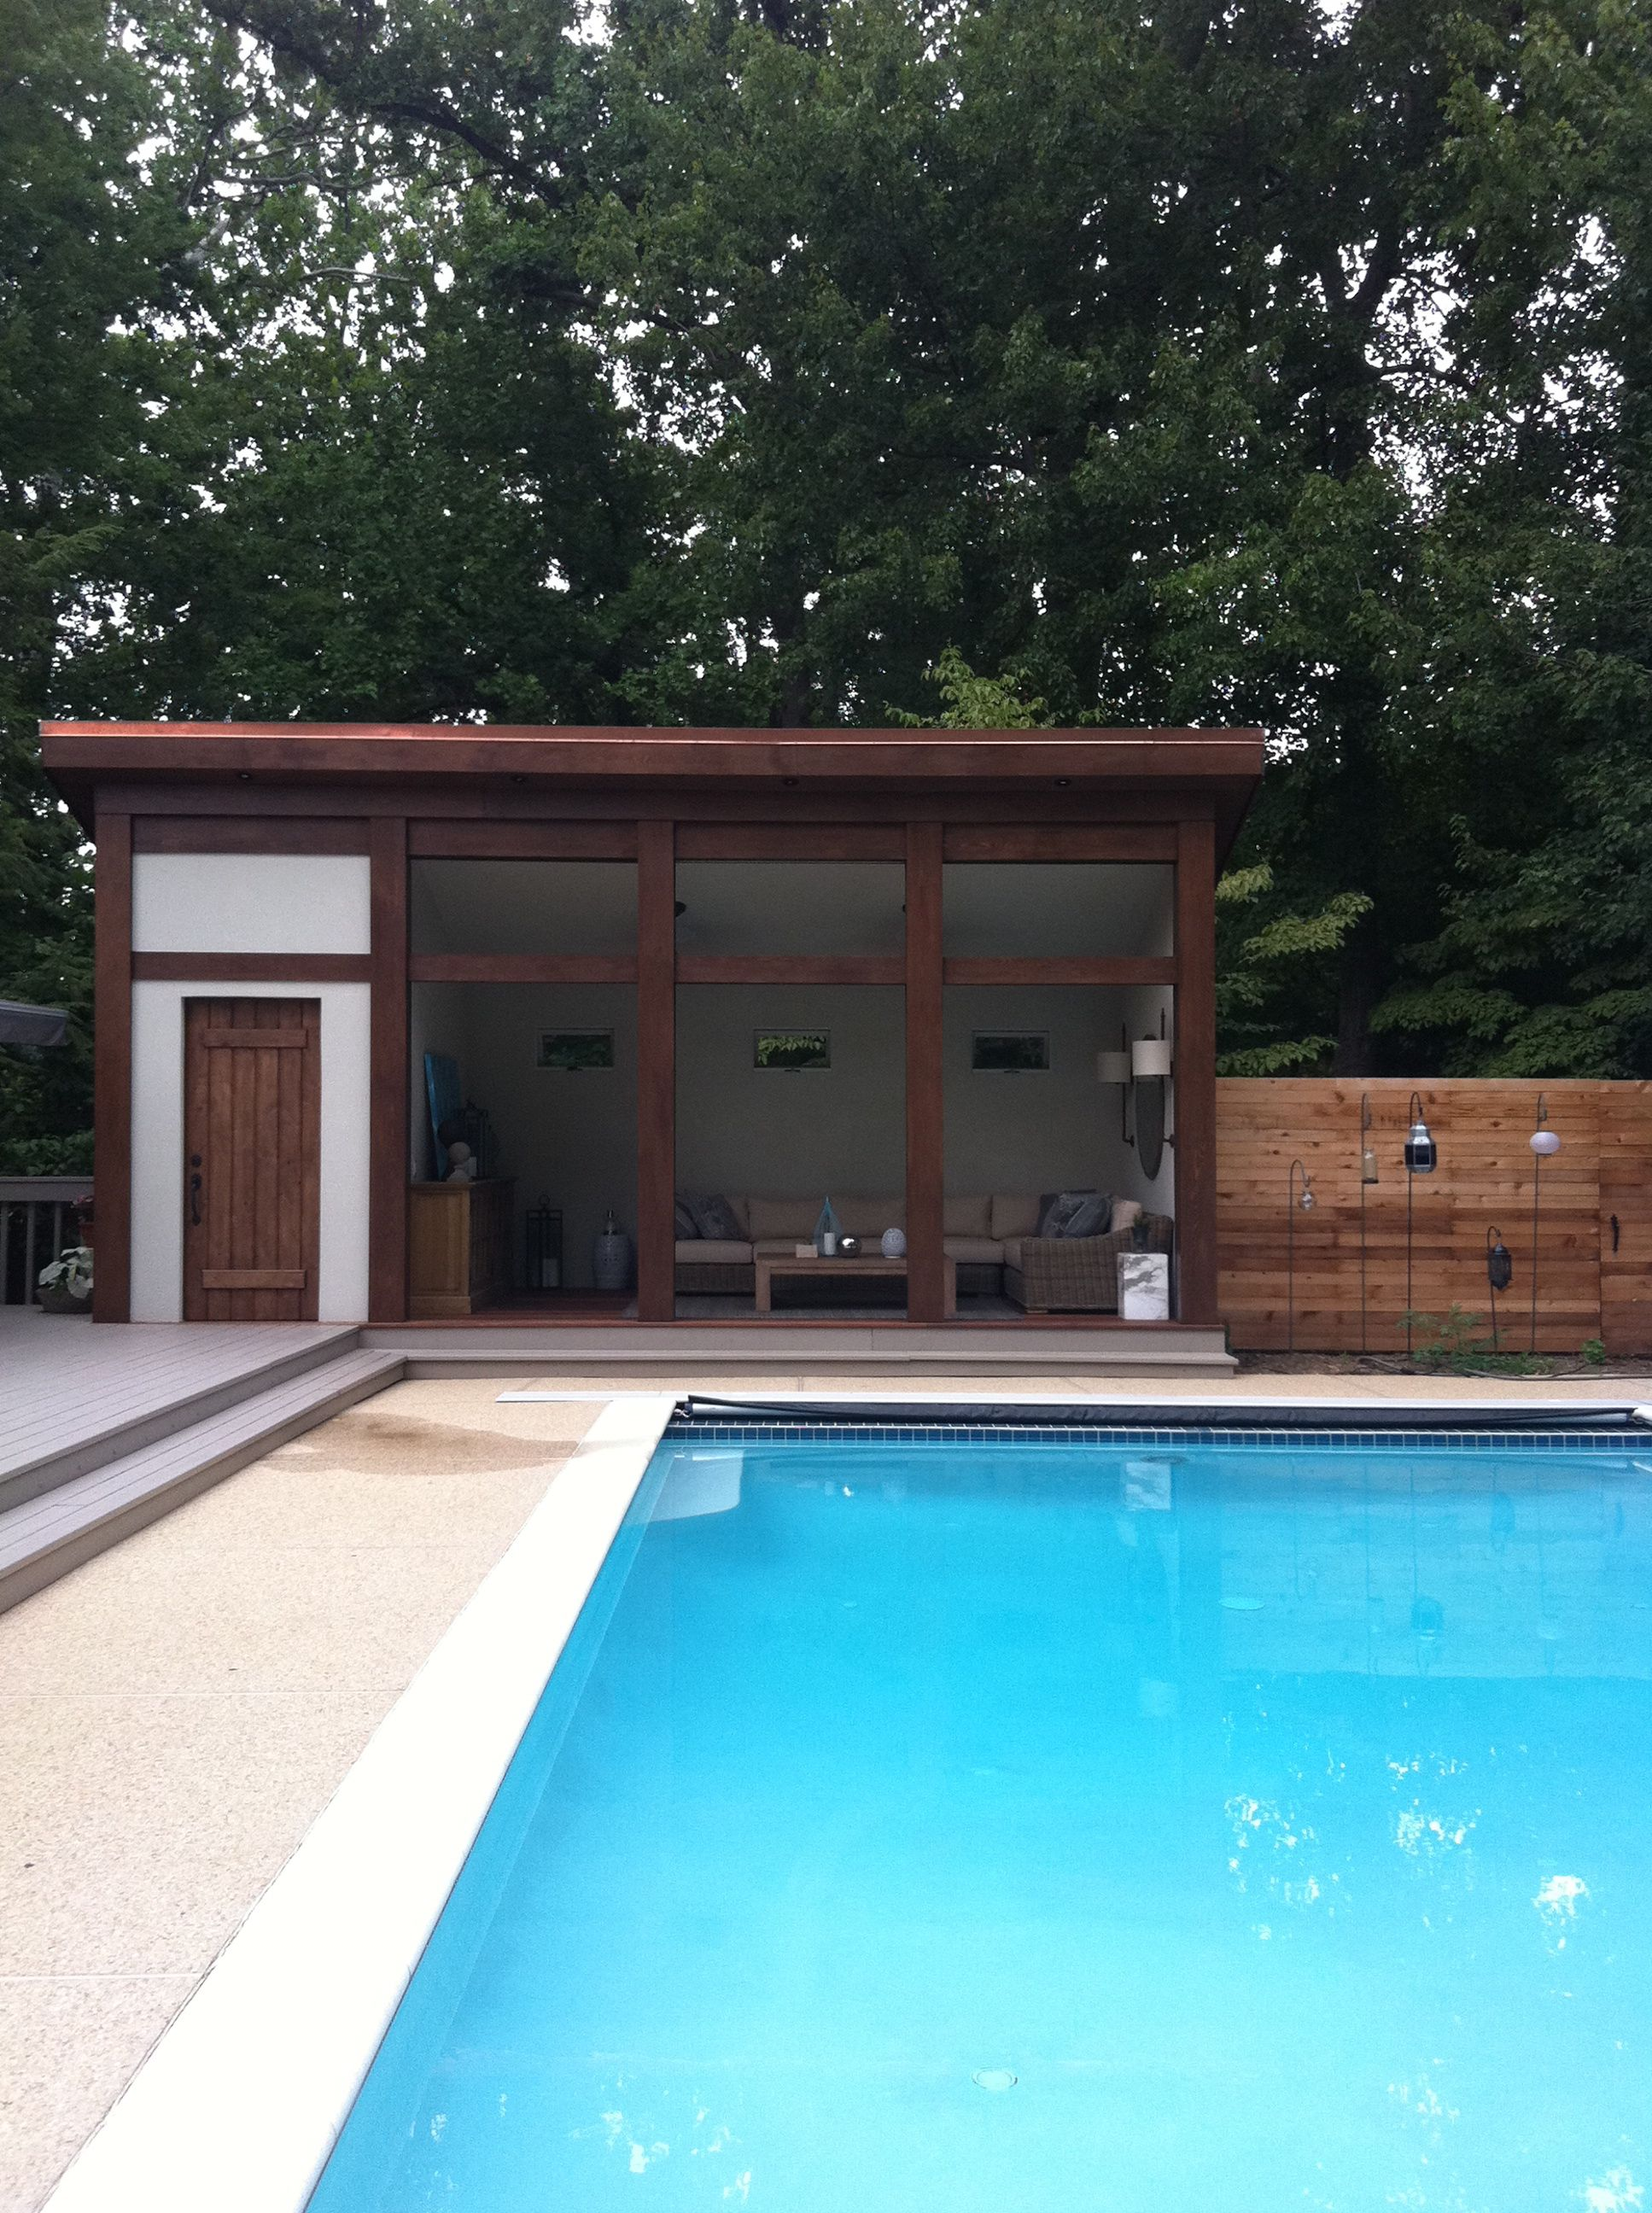 Pool Cabana Pool Houses Pool Cabana Pool House